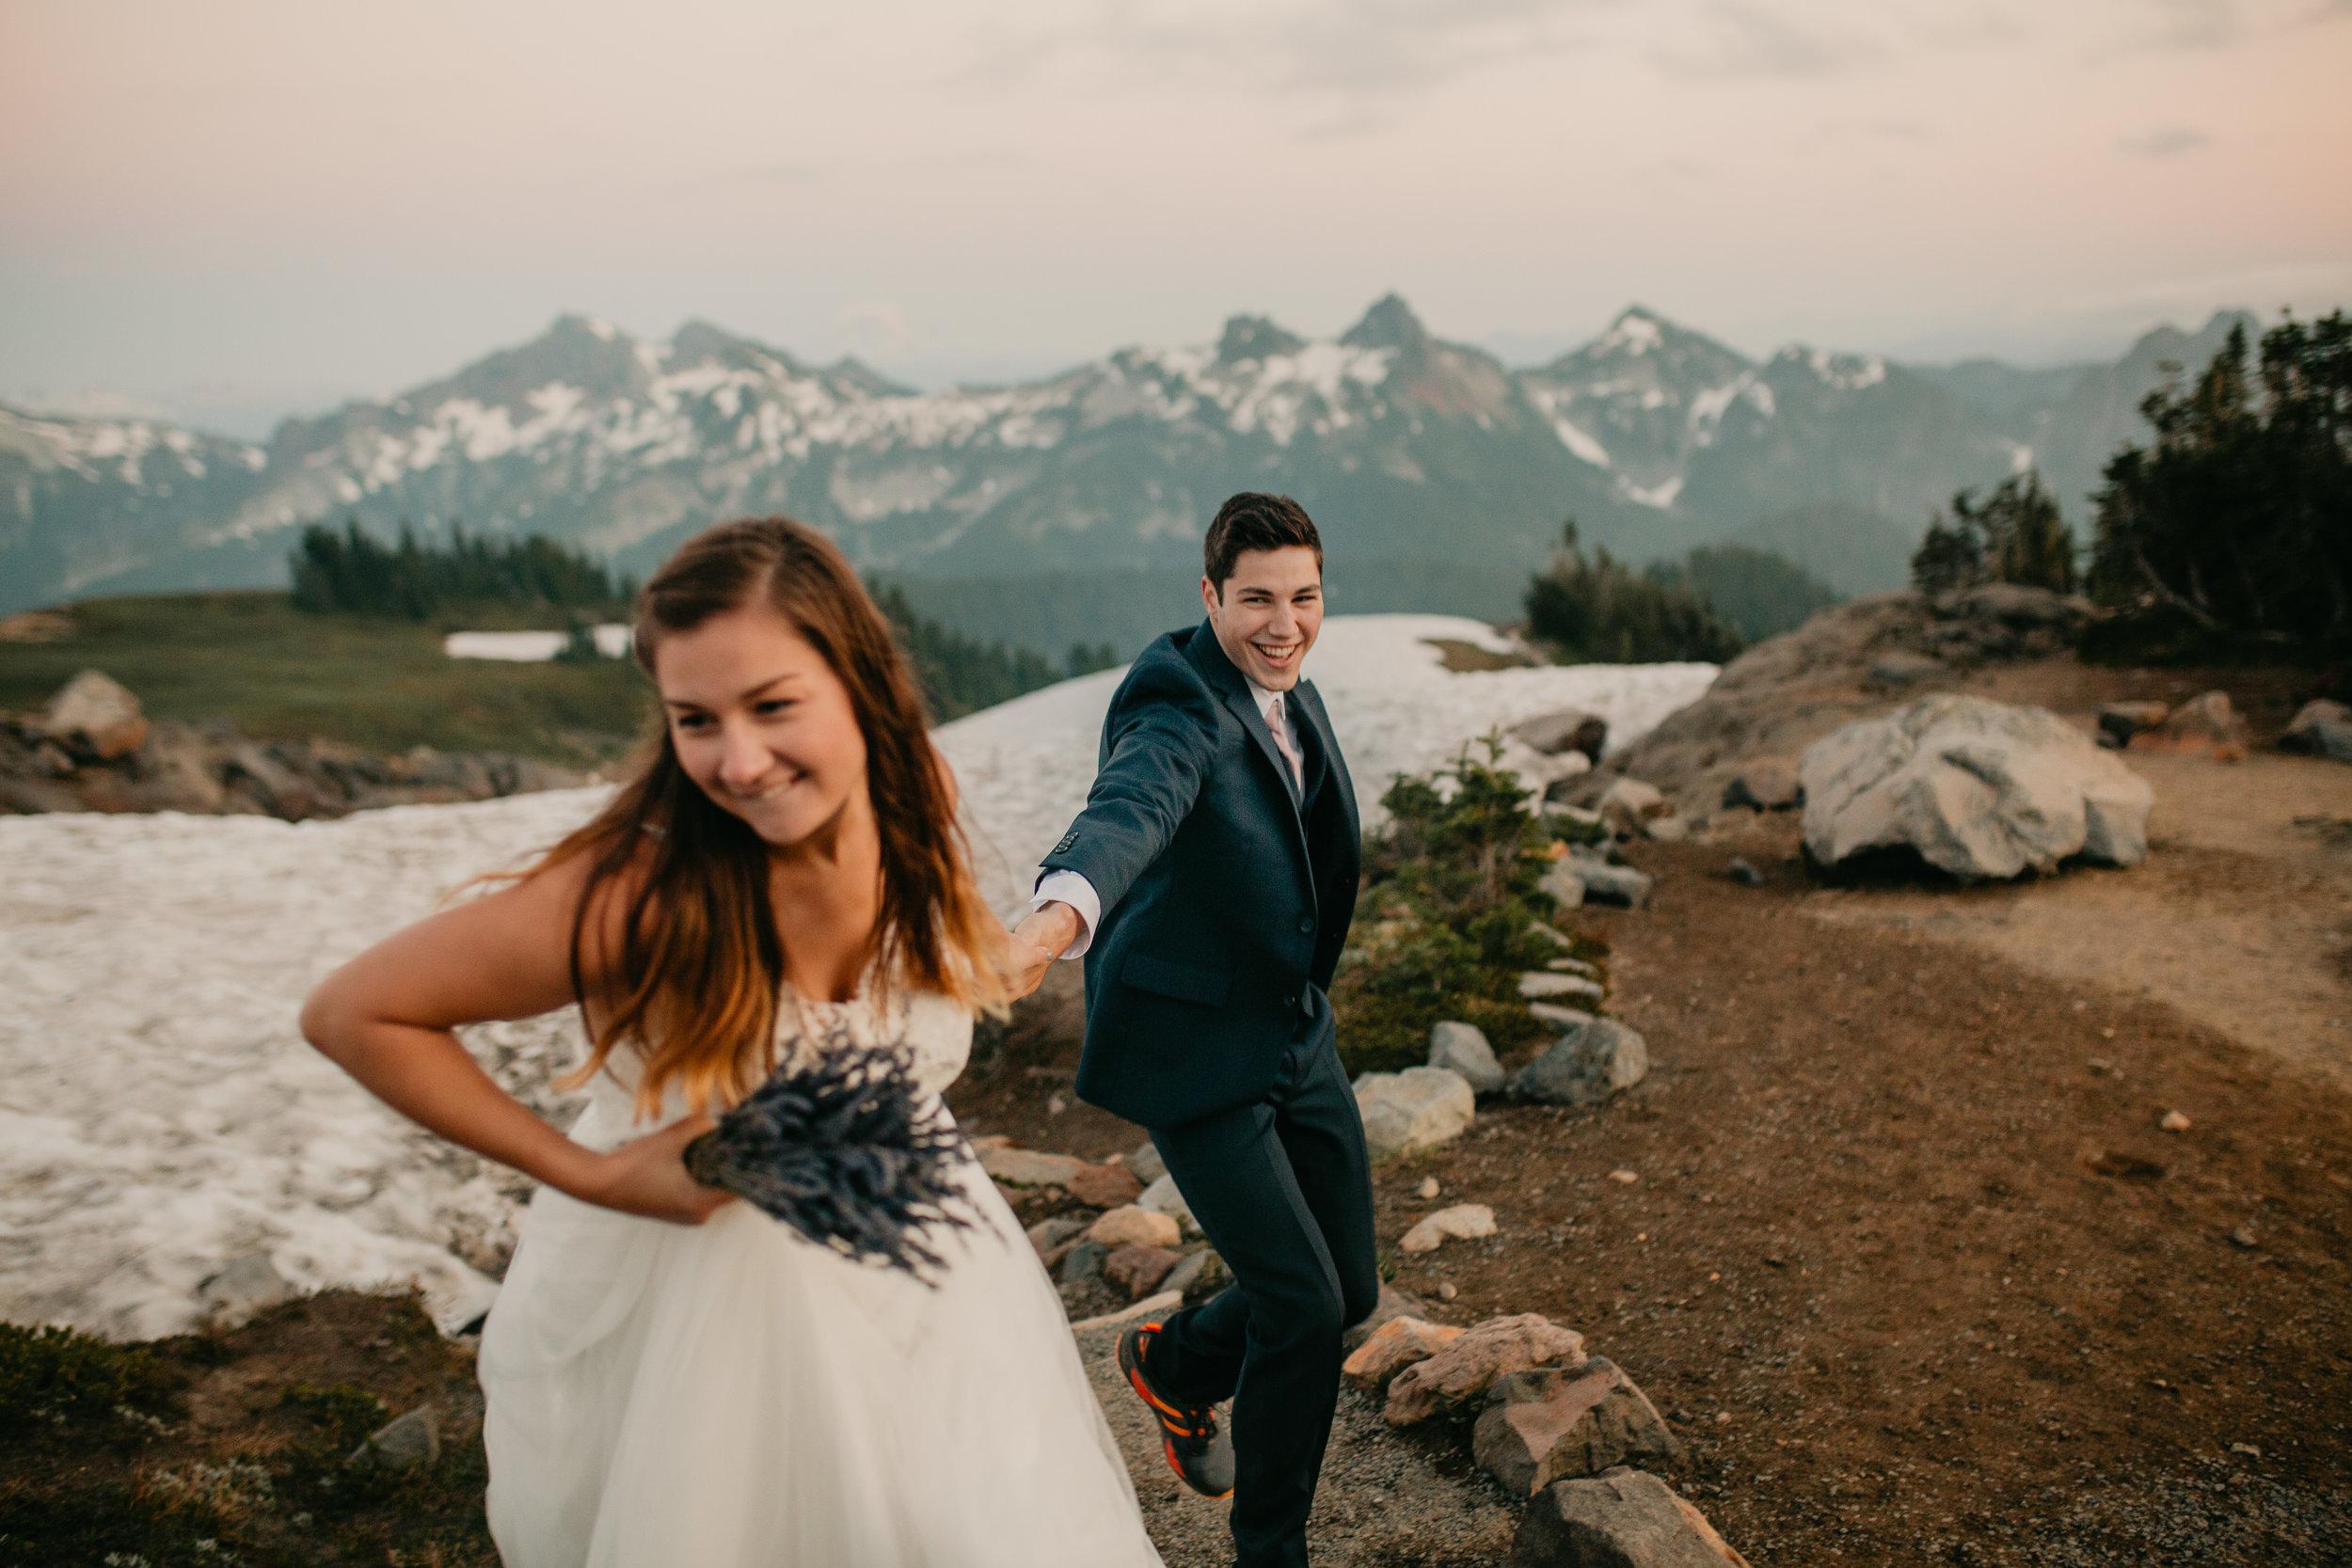 Nicole-Daacke-Photography-Mt-Rainier-elopement-photographer-washington-mountain-epic-wedding-photography-wildflowers-at-rainier-pine-tree-cloudy-summer-day-at-mountain-rainier-75.jpg